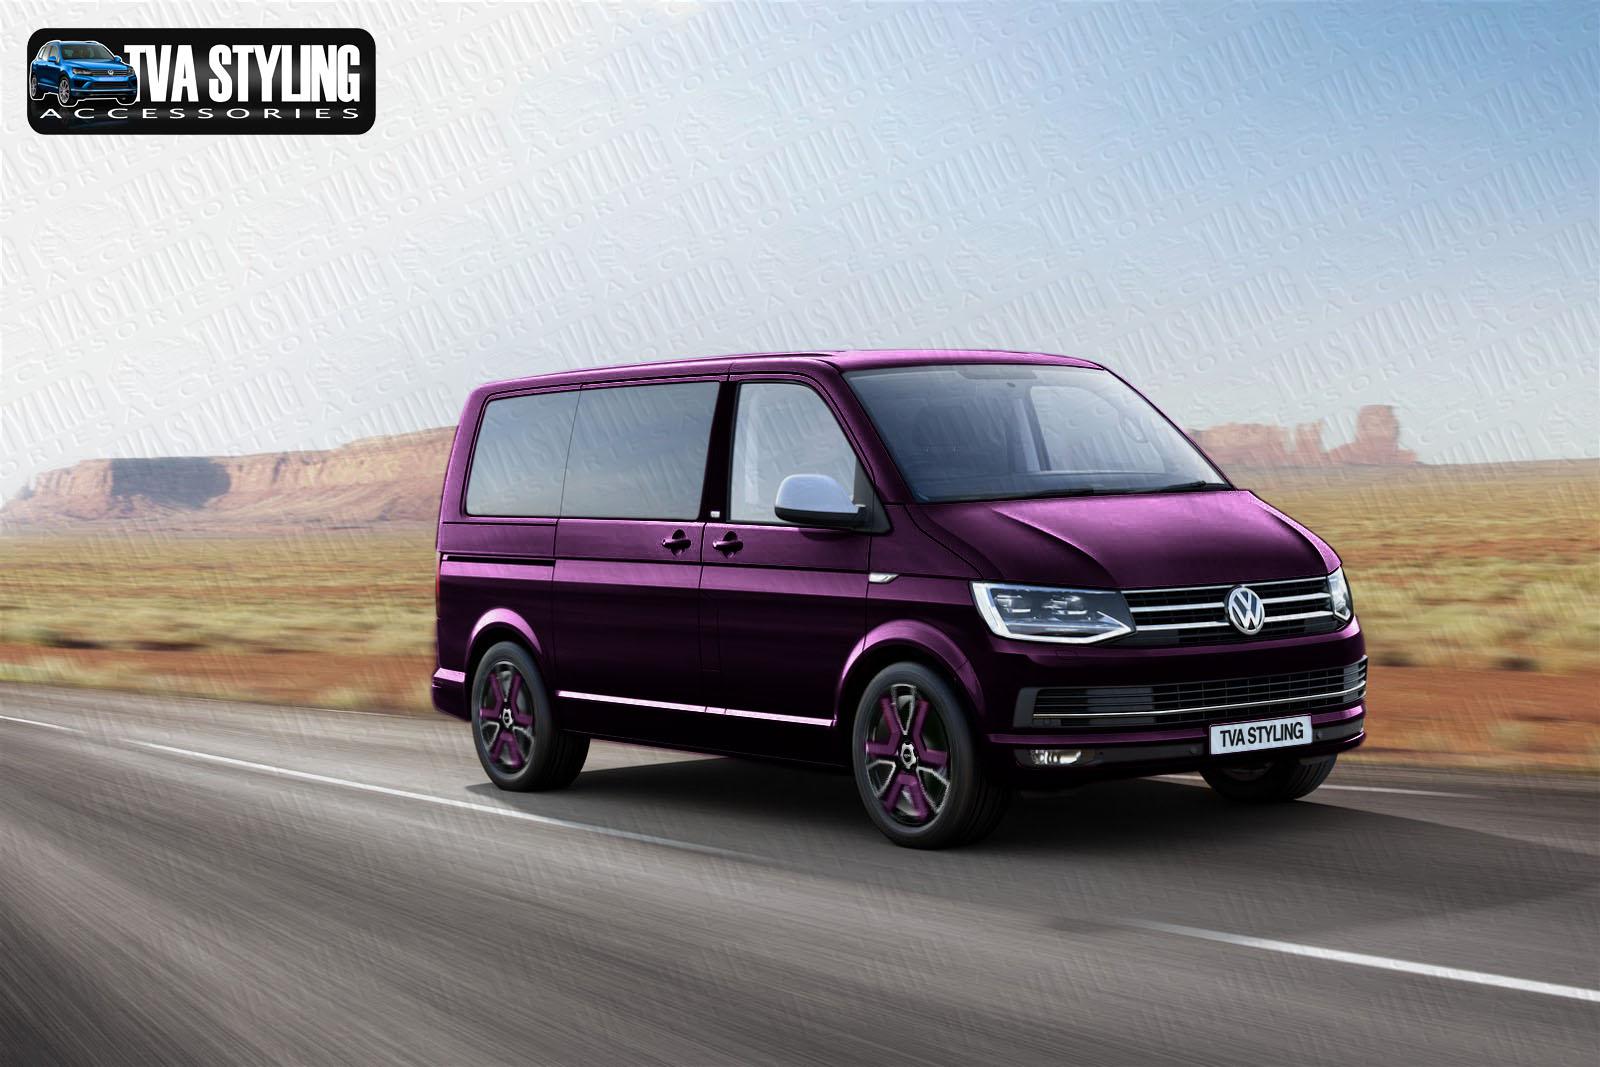 vw transporter t6 alloy wheels in vw colour tva styling. Black Bedroom Furniture Sets. Home Design Ideas